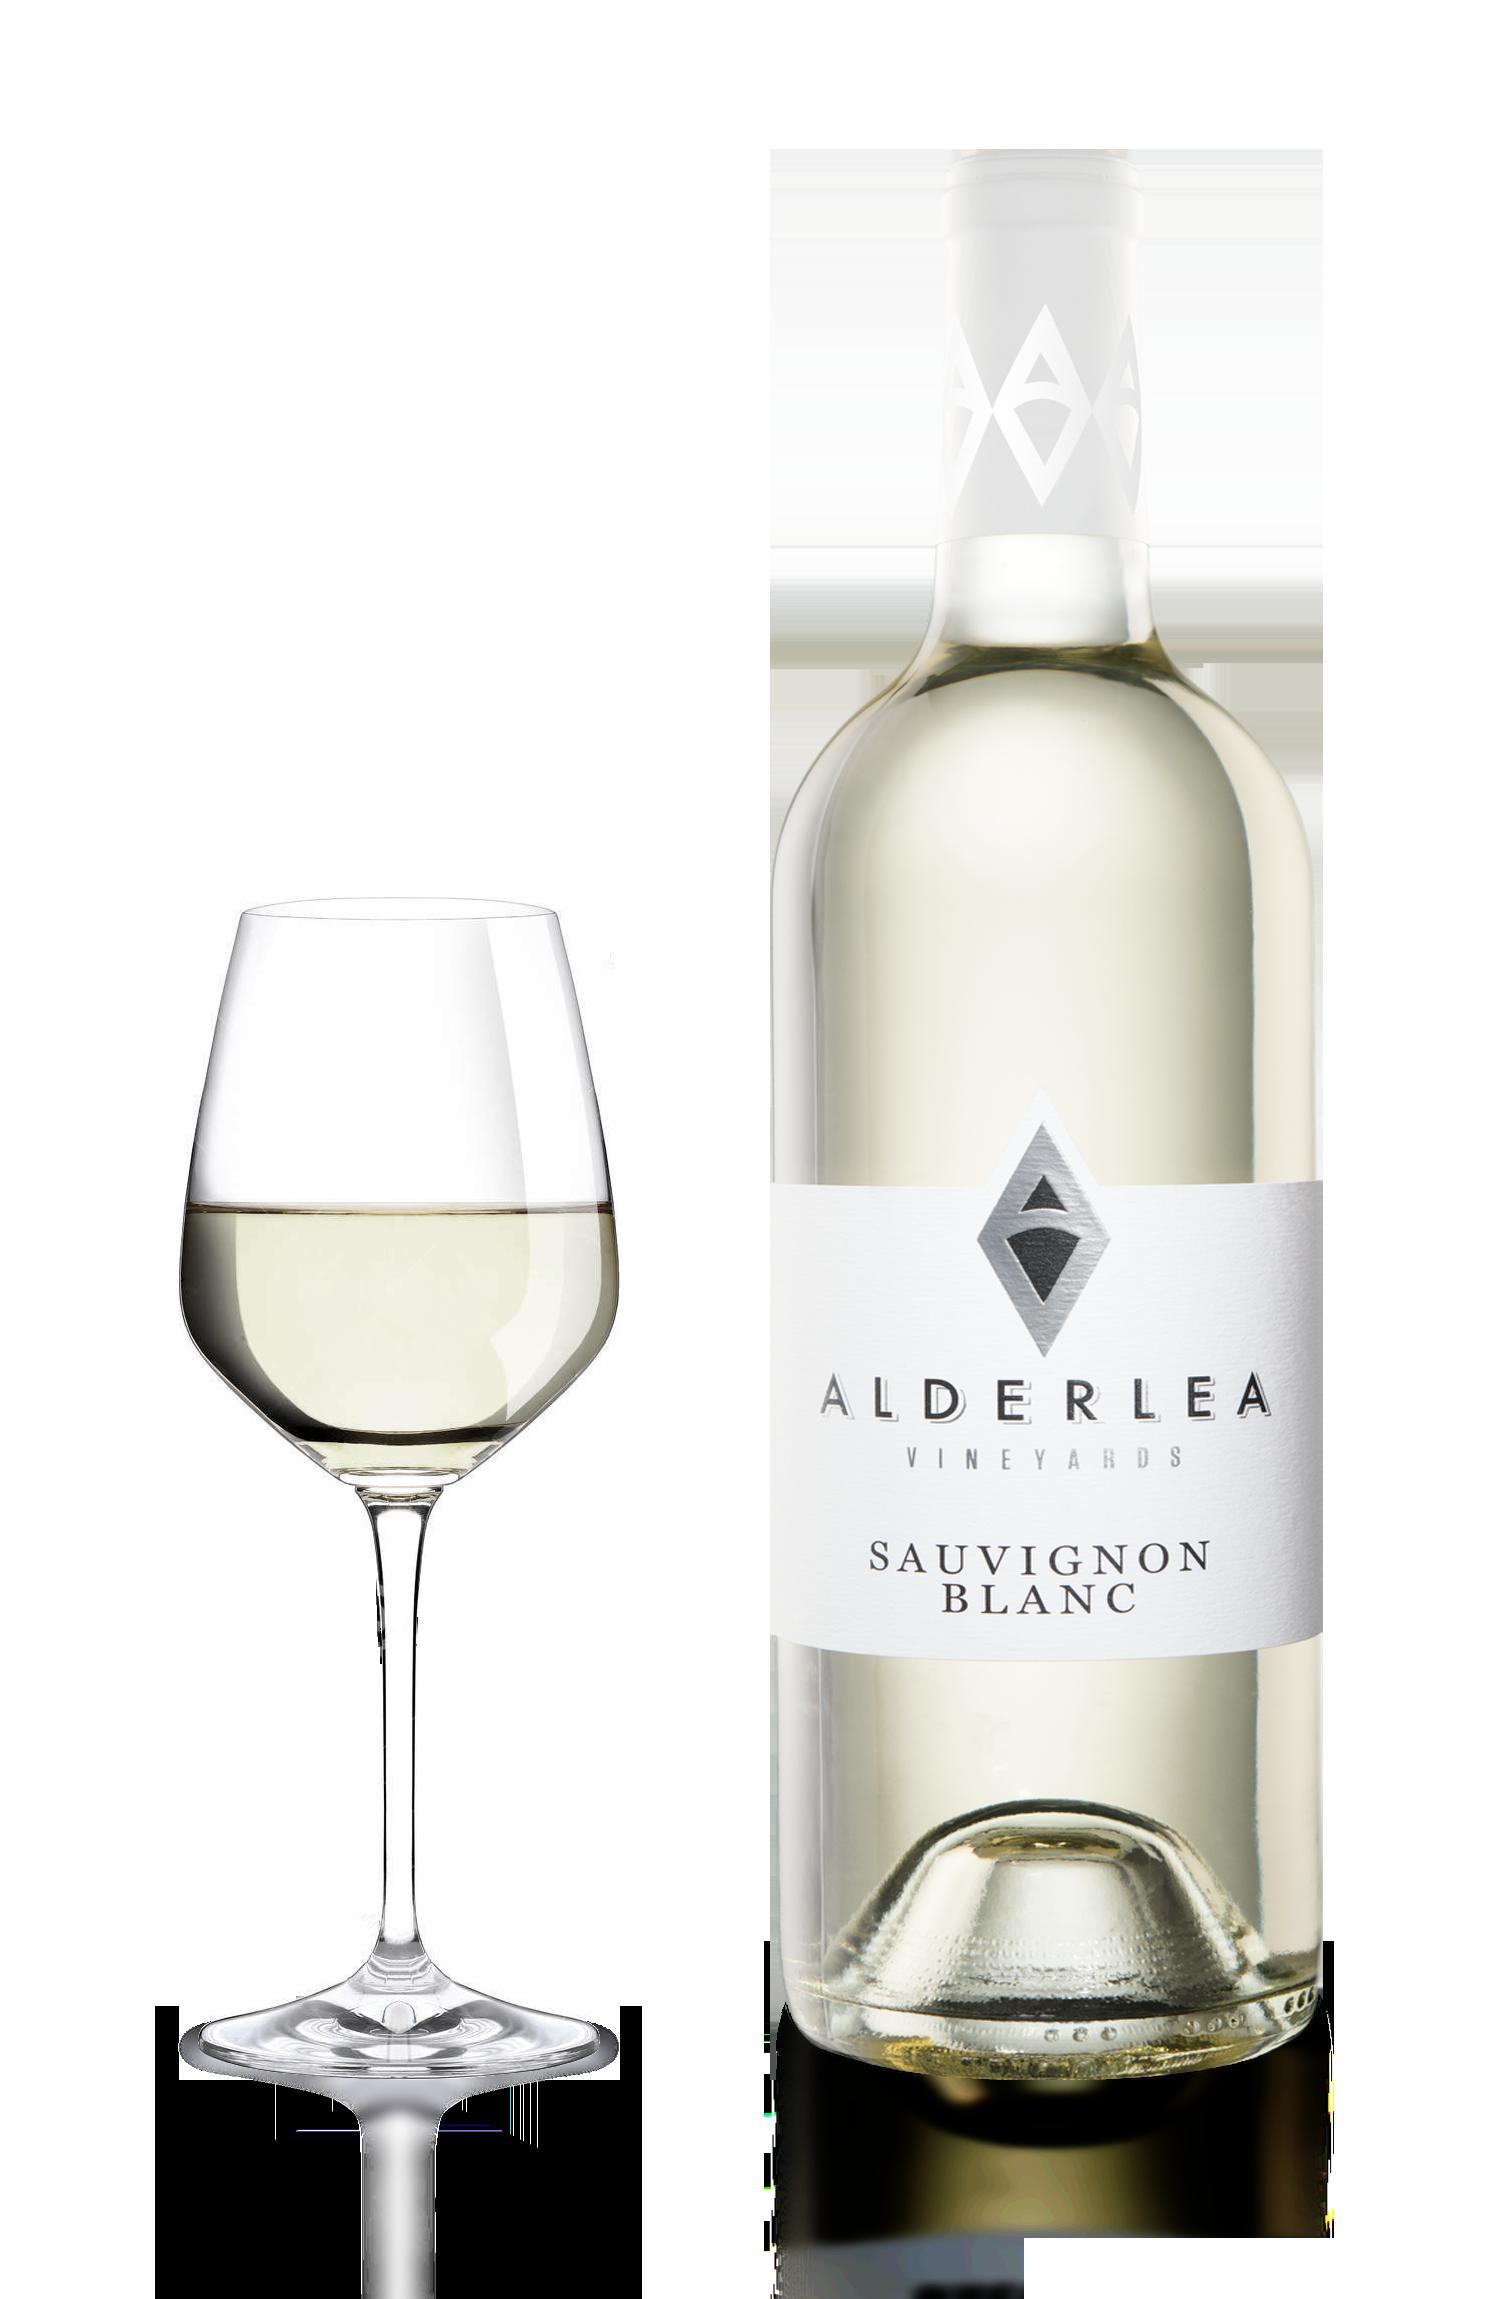 Alderlea Sauvignon Blanc